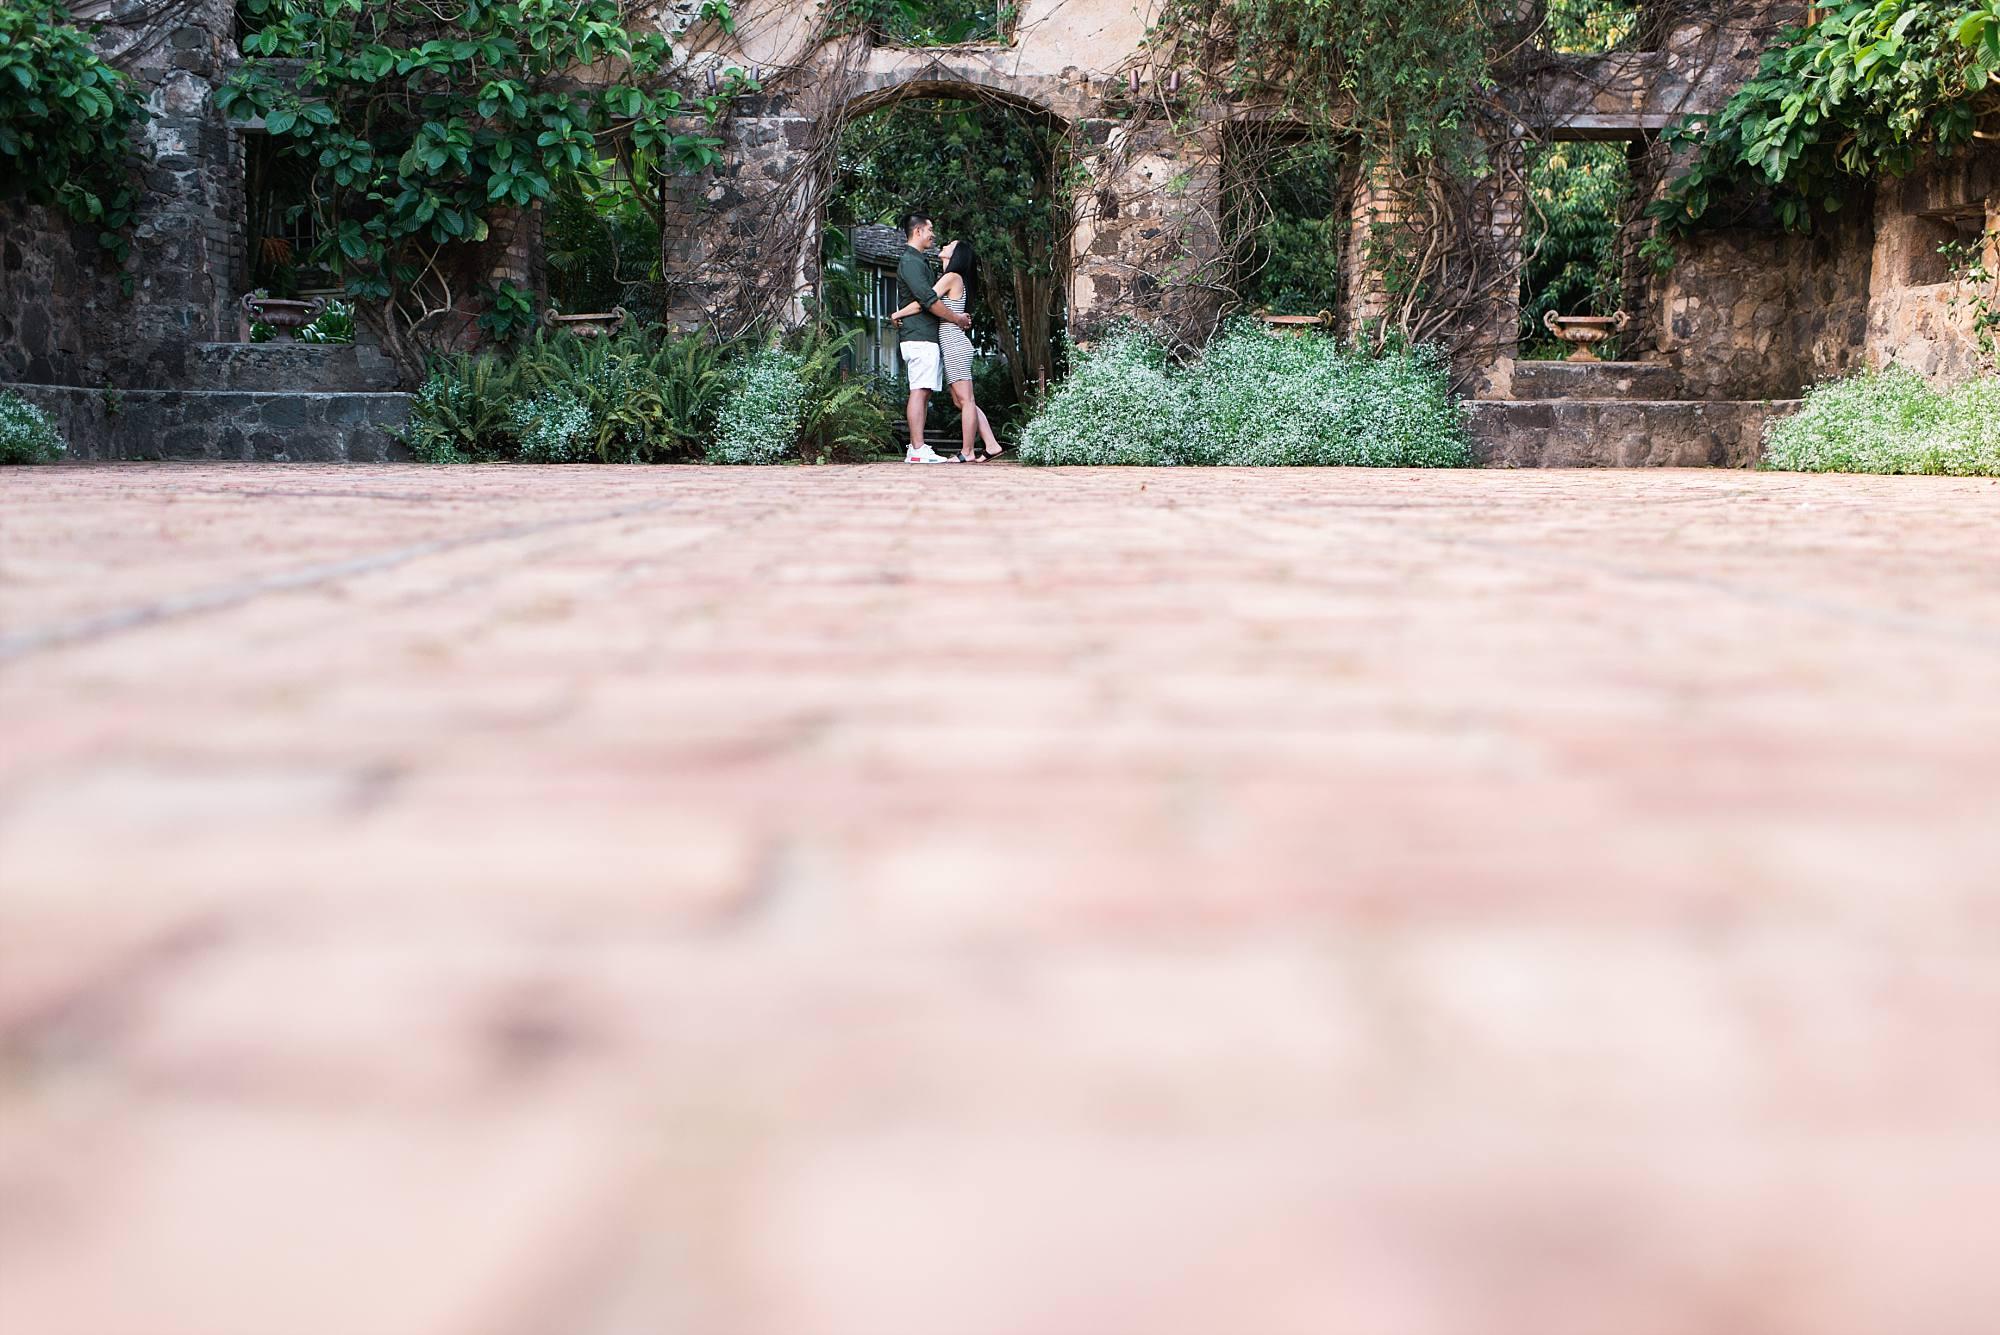 Fiances standing insisde stone arch-doorway at haiku Mill